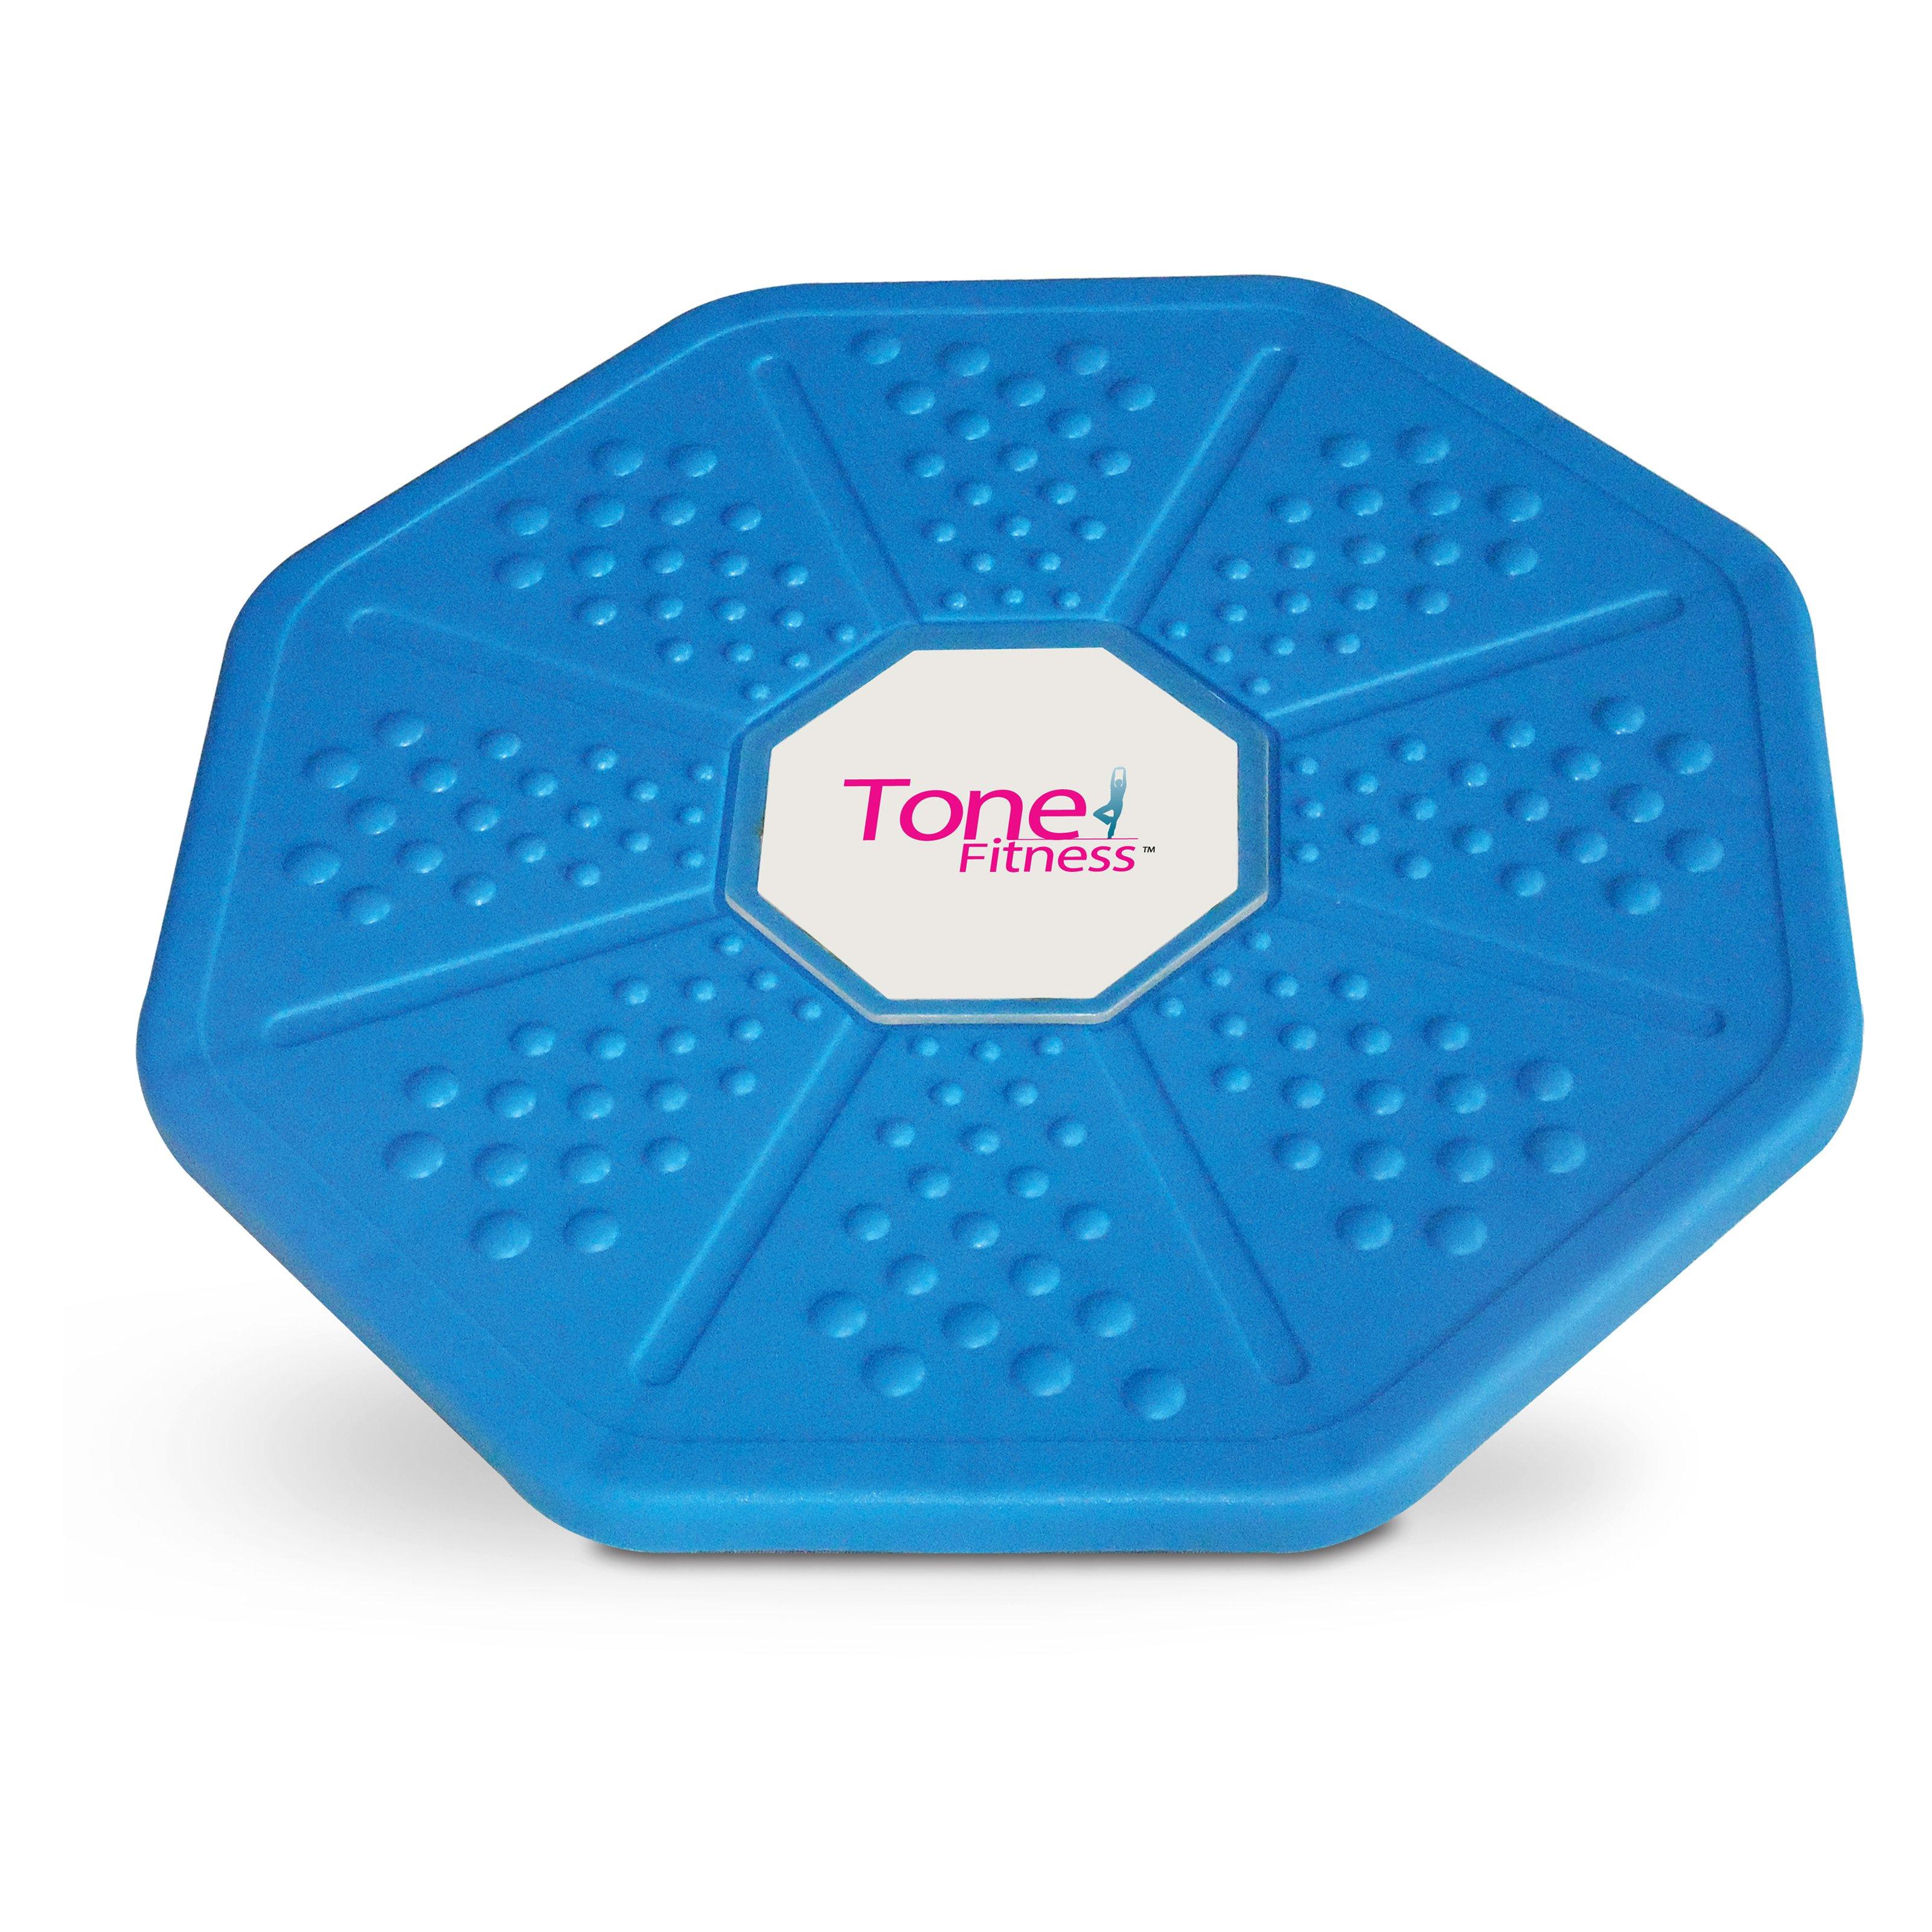 Tone Fitness Balance Board in Blue